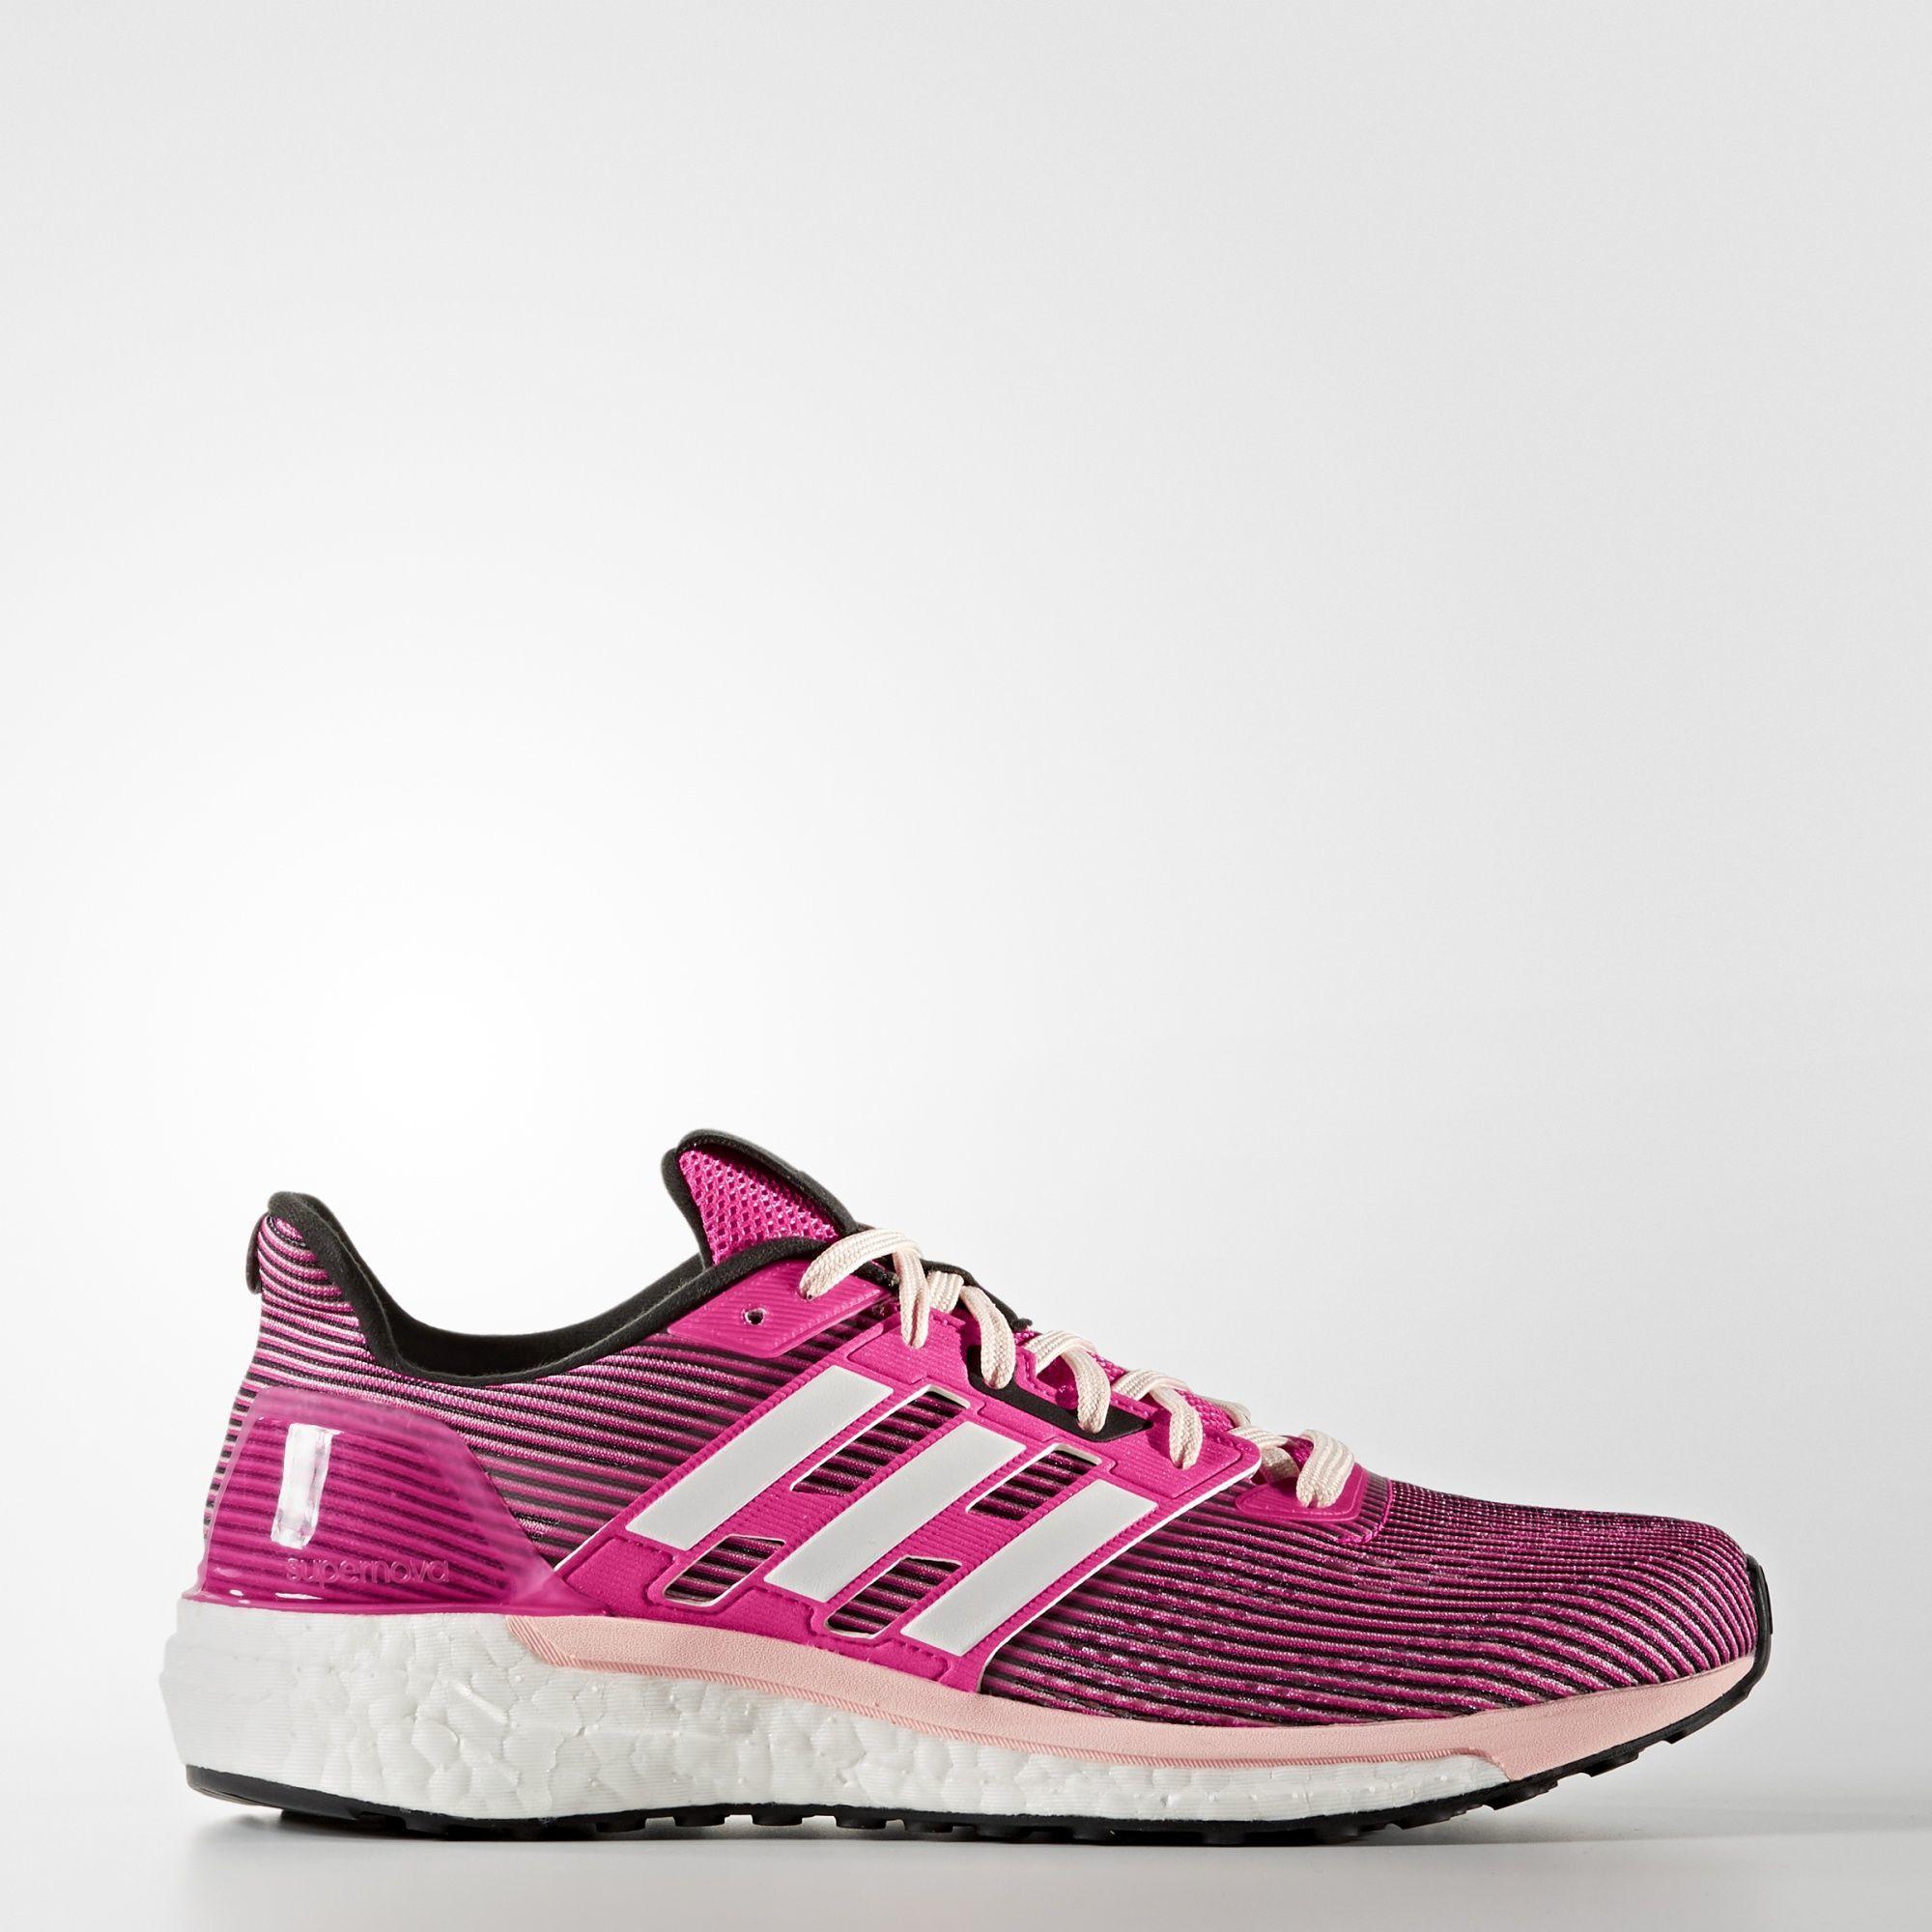 adidas Supernova w in Pink